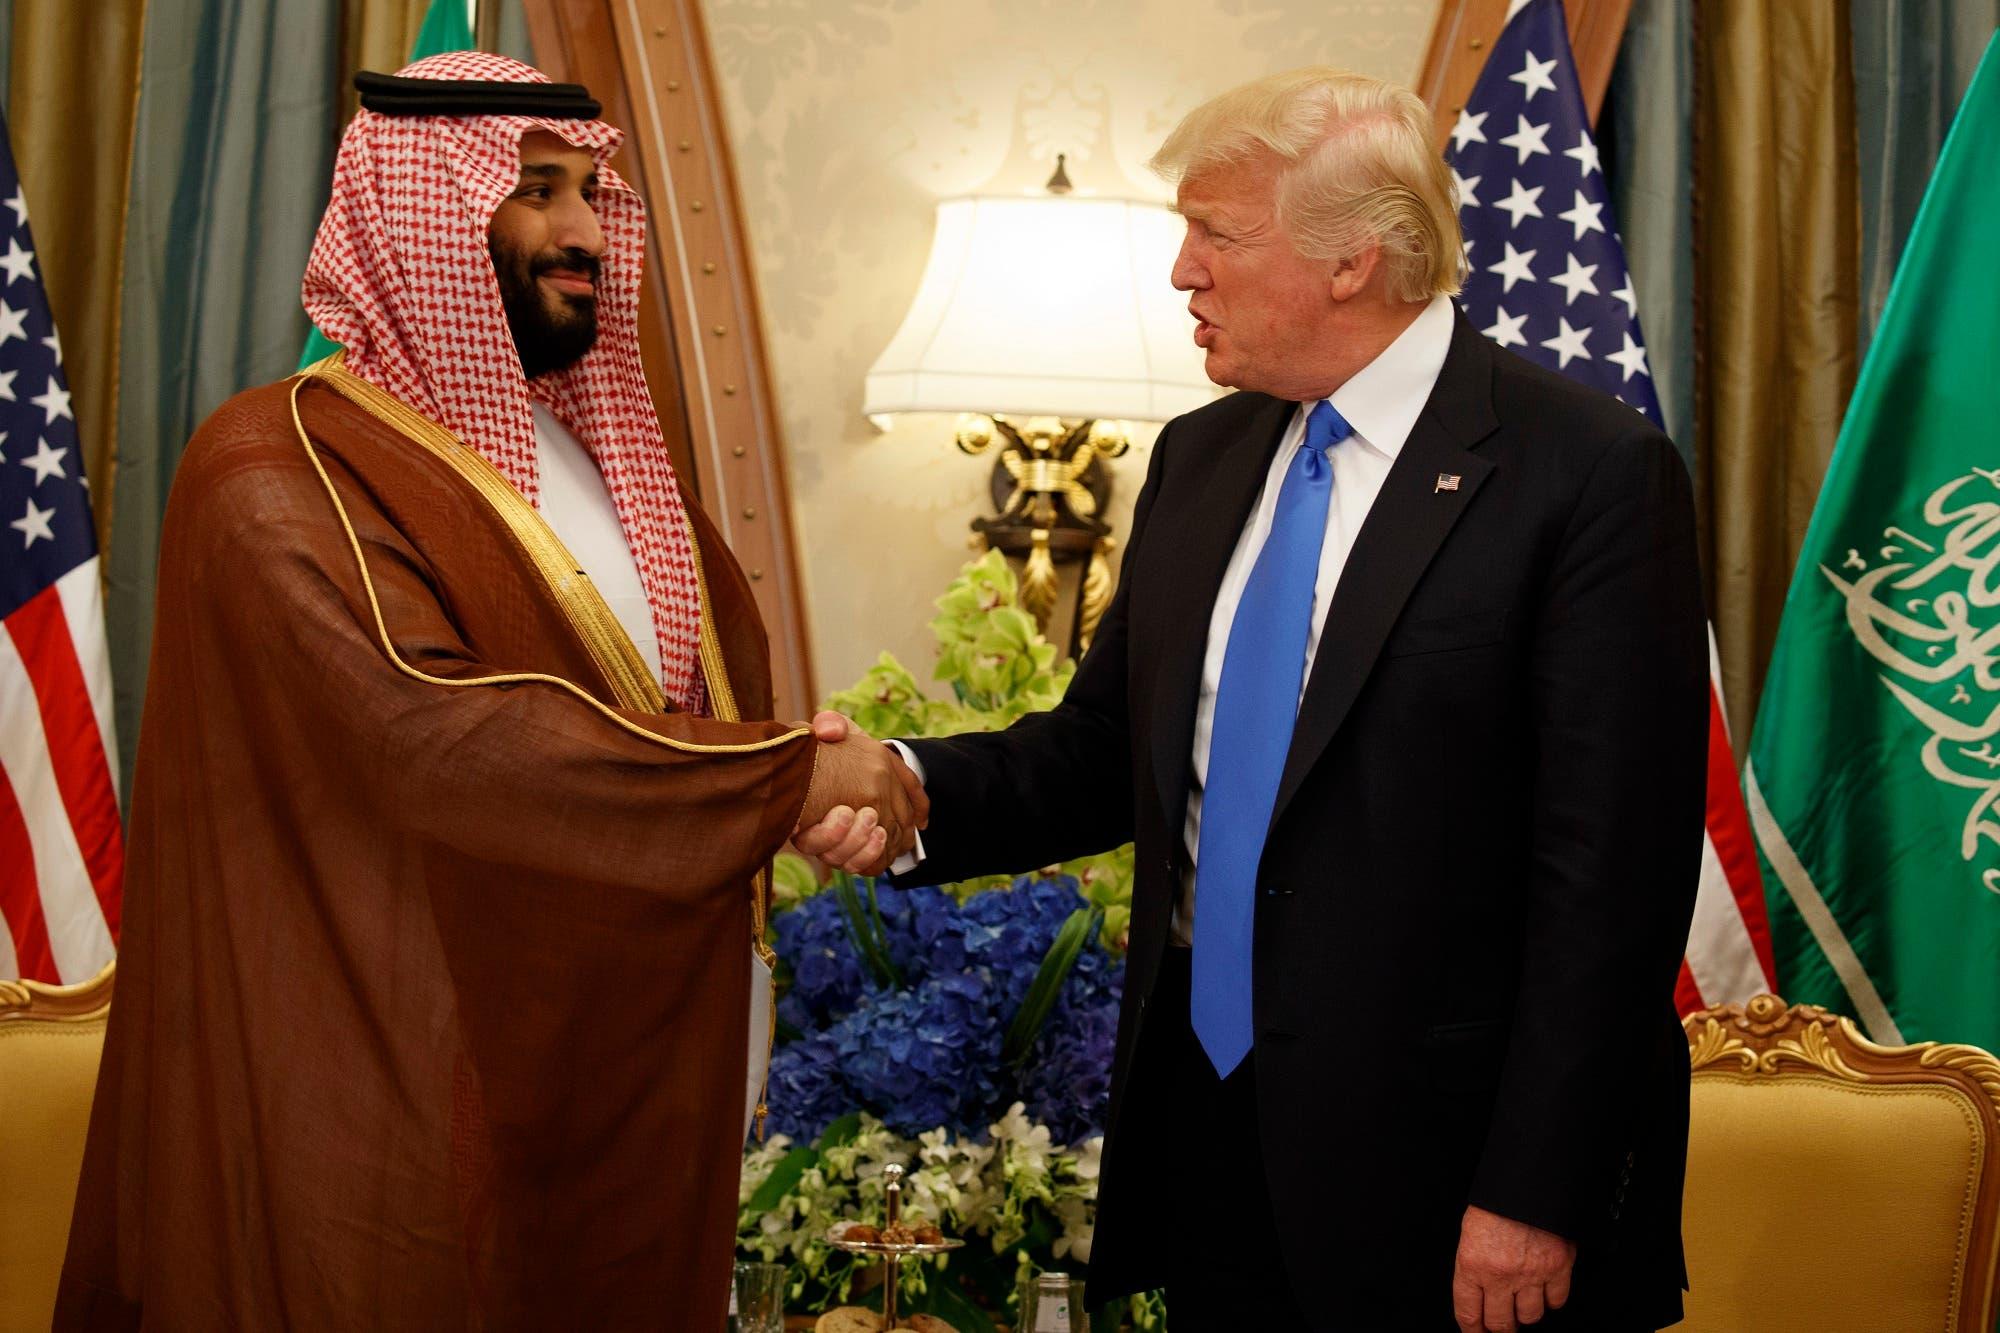 Saudi Deputy Crown Prince and Defense Minister Mohammed bin Salman bin Abdulaziz with President Donald Trump during a bilateral meeting in Riyadh. (AP)